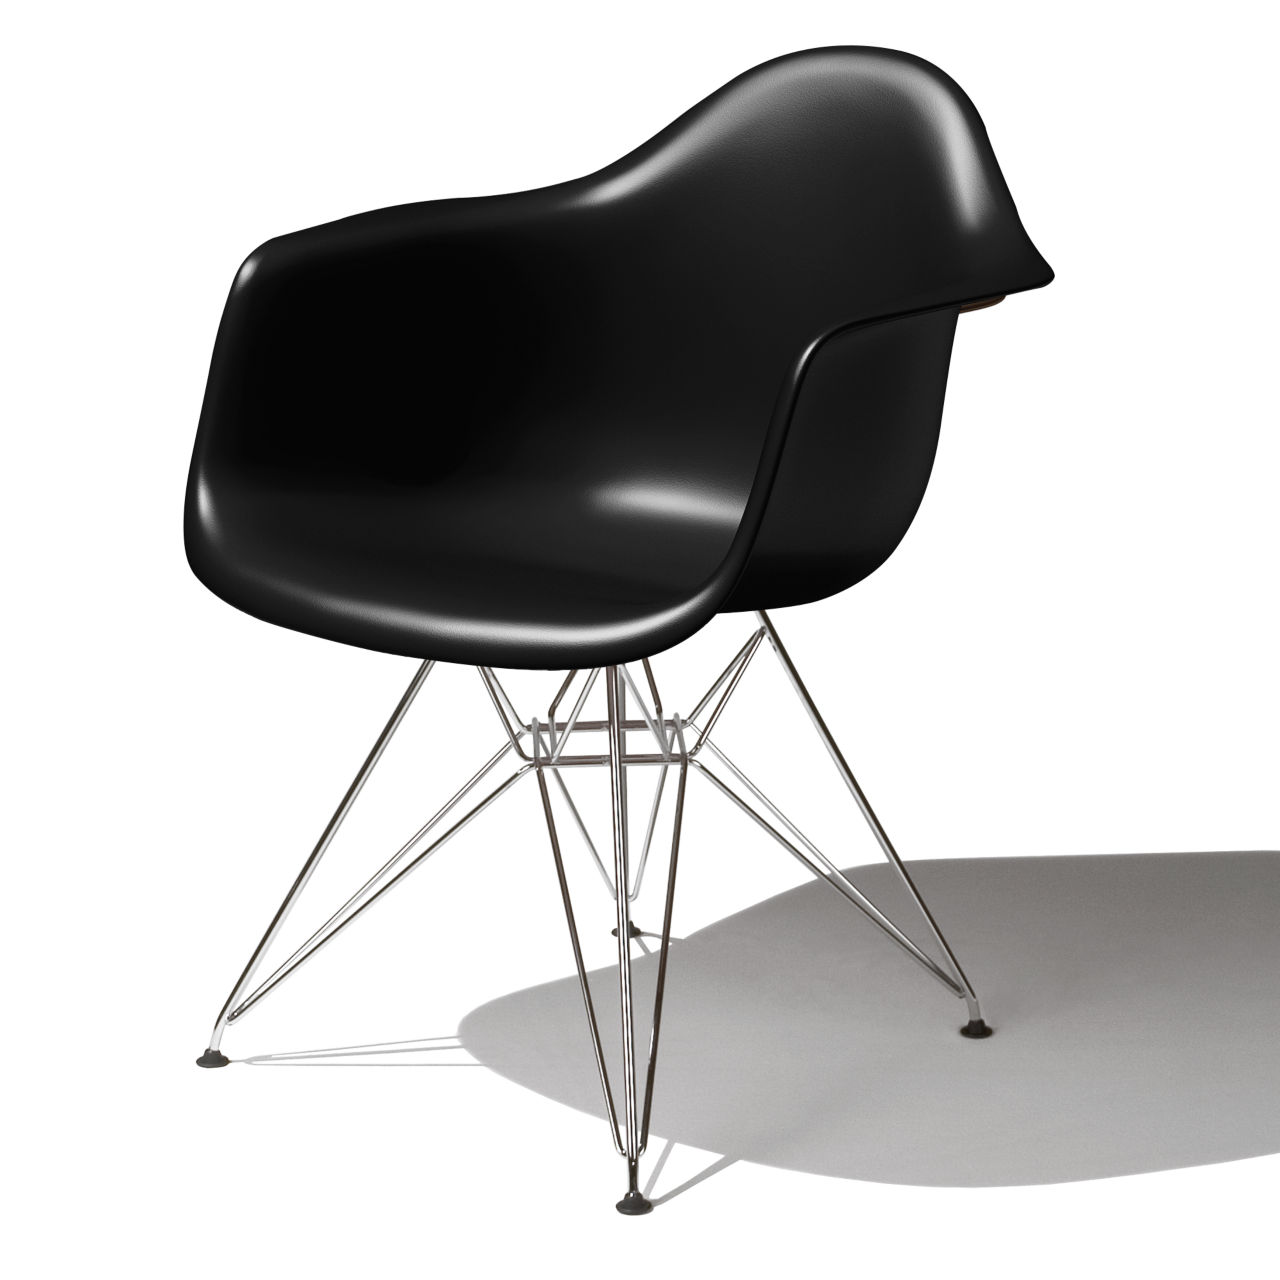 Eames Molded Plastic Armchair in Black by Herman Miller